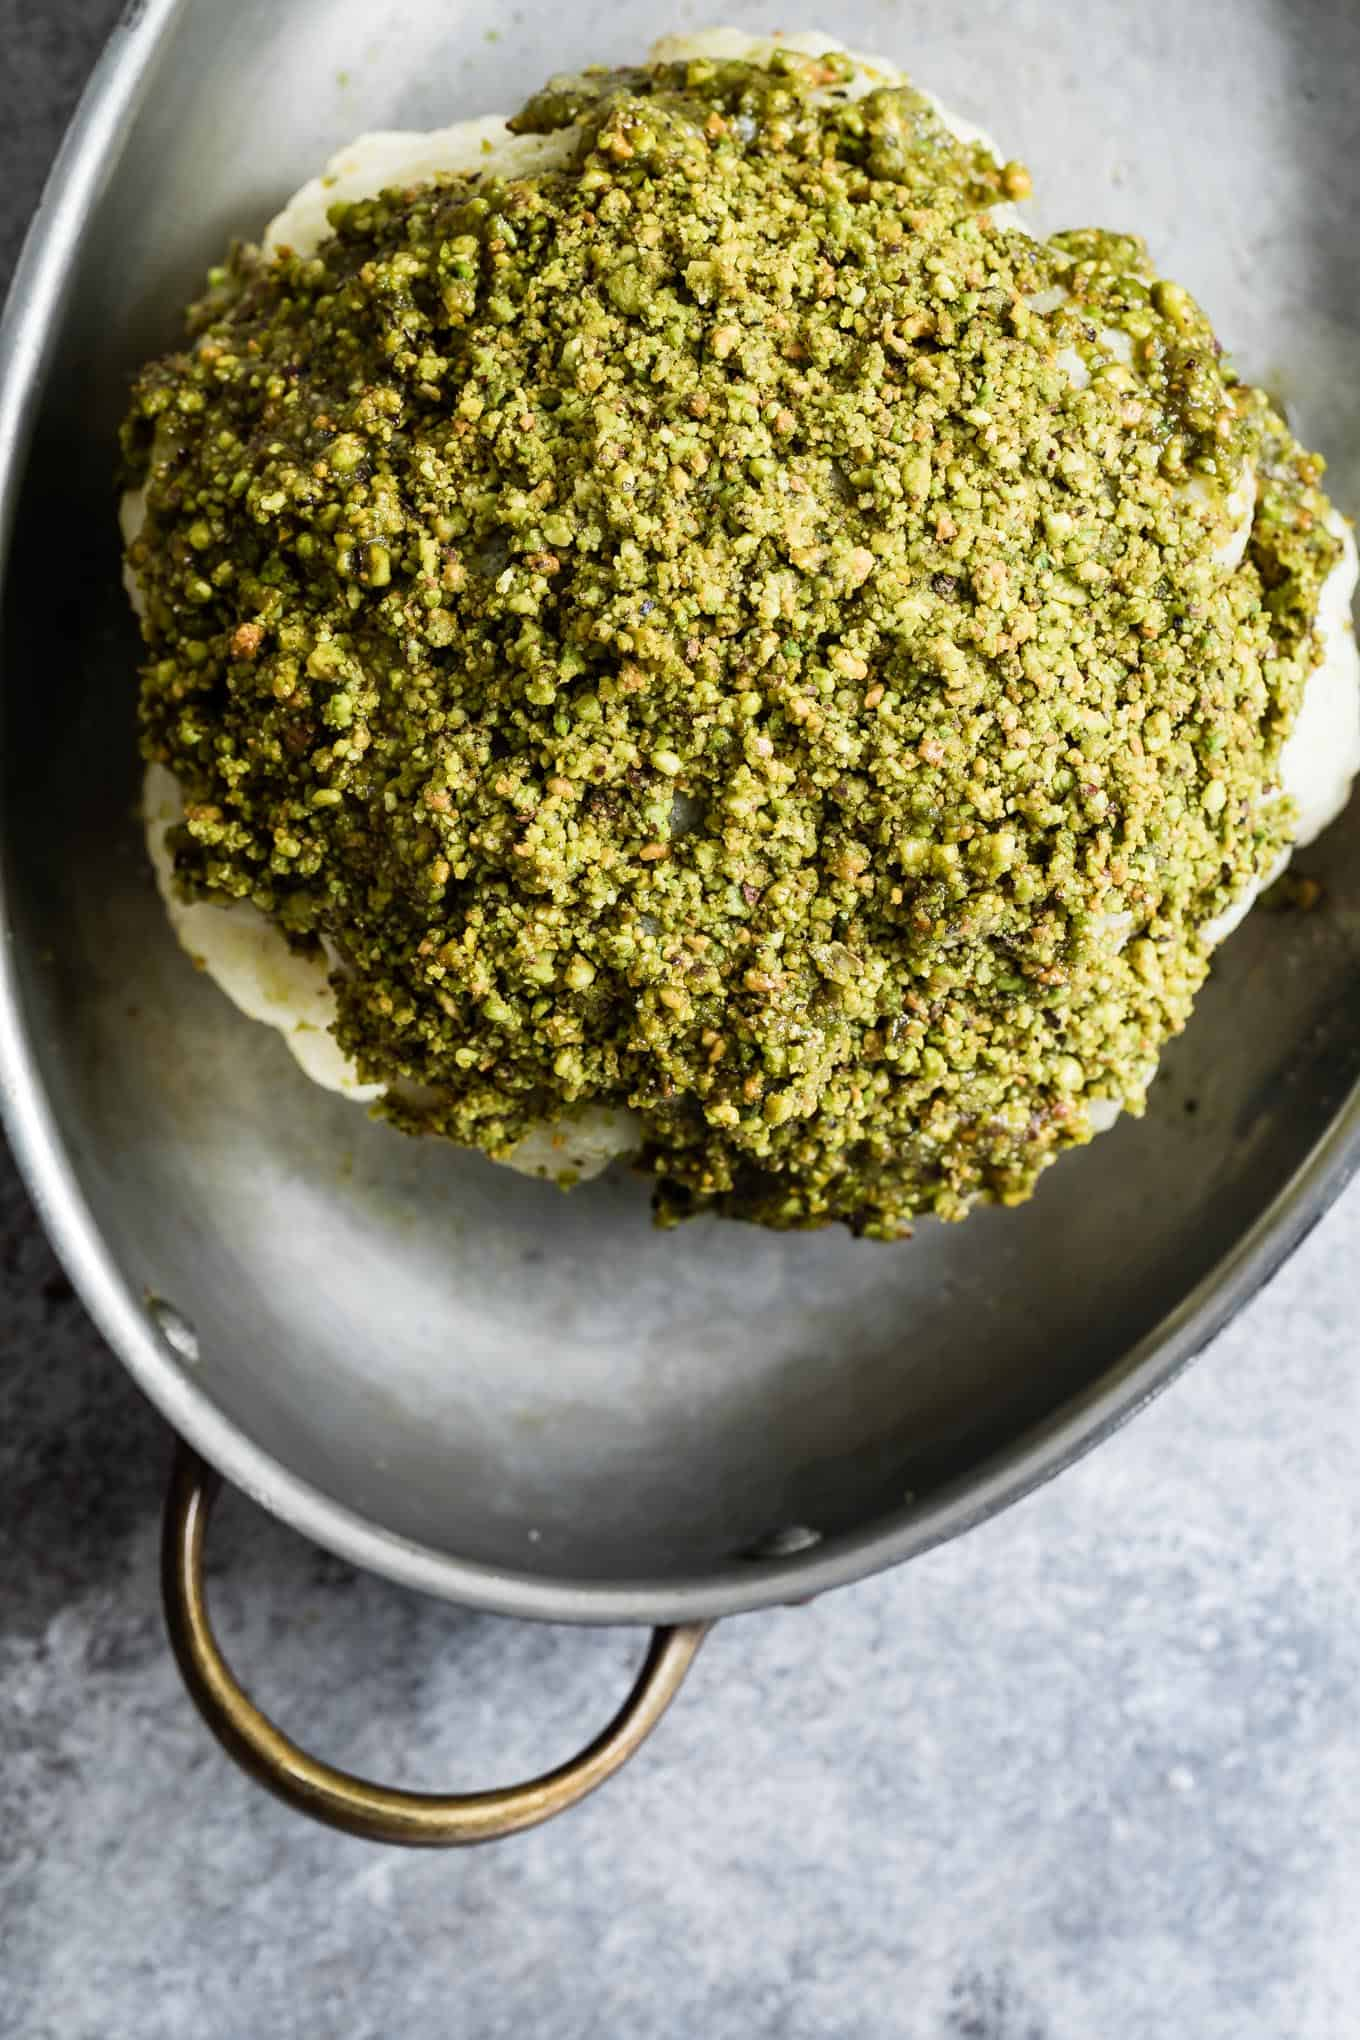 Pistachio-Crusted Whole Roasted Cauliflower Recipe